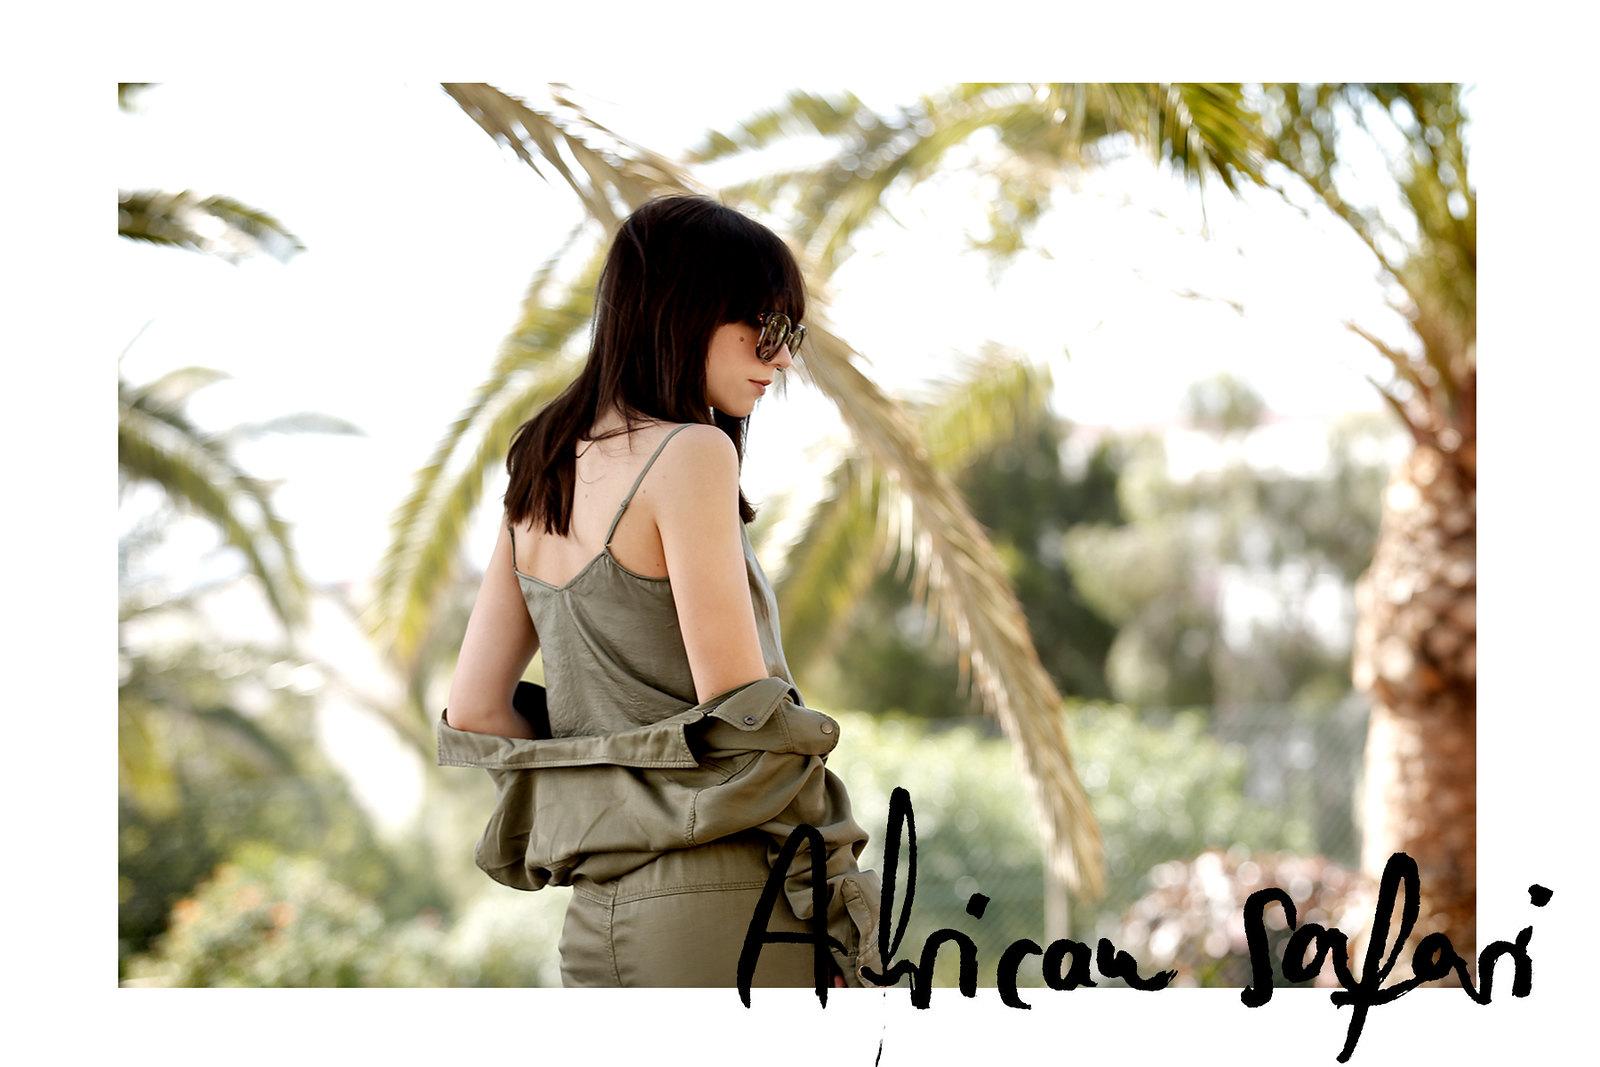 promod african safari jumpsuit khaki outfit ootd blogger modeblogger gucci dionysus céline audrey summer palms travelblogger cats & dogs ricarda schernus düsseldorf blog 4